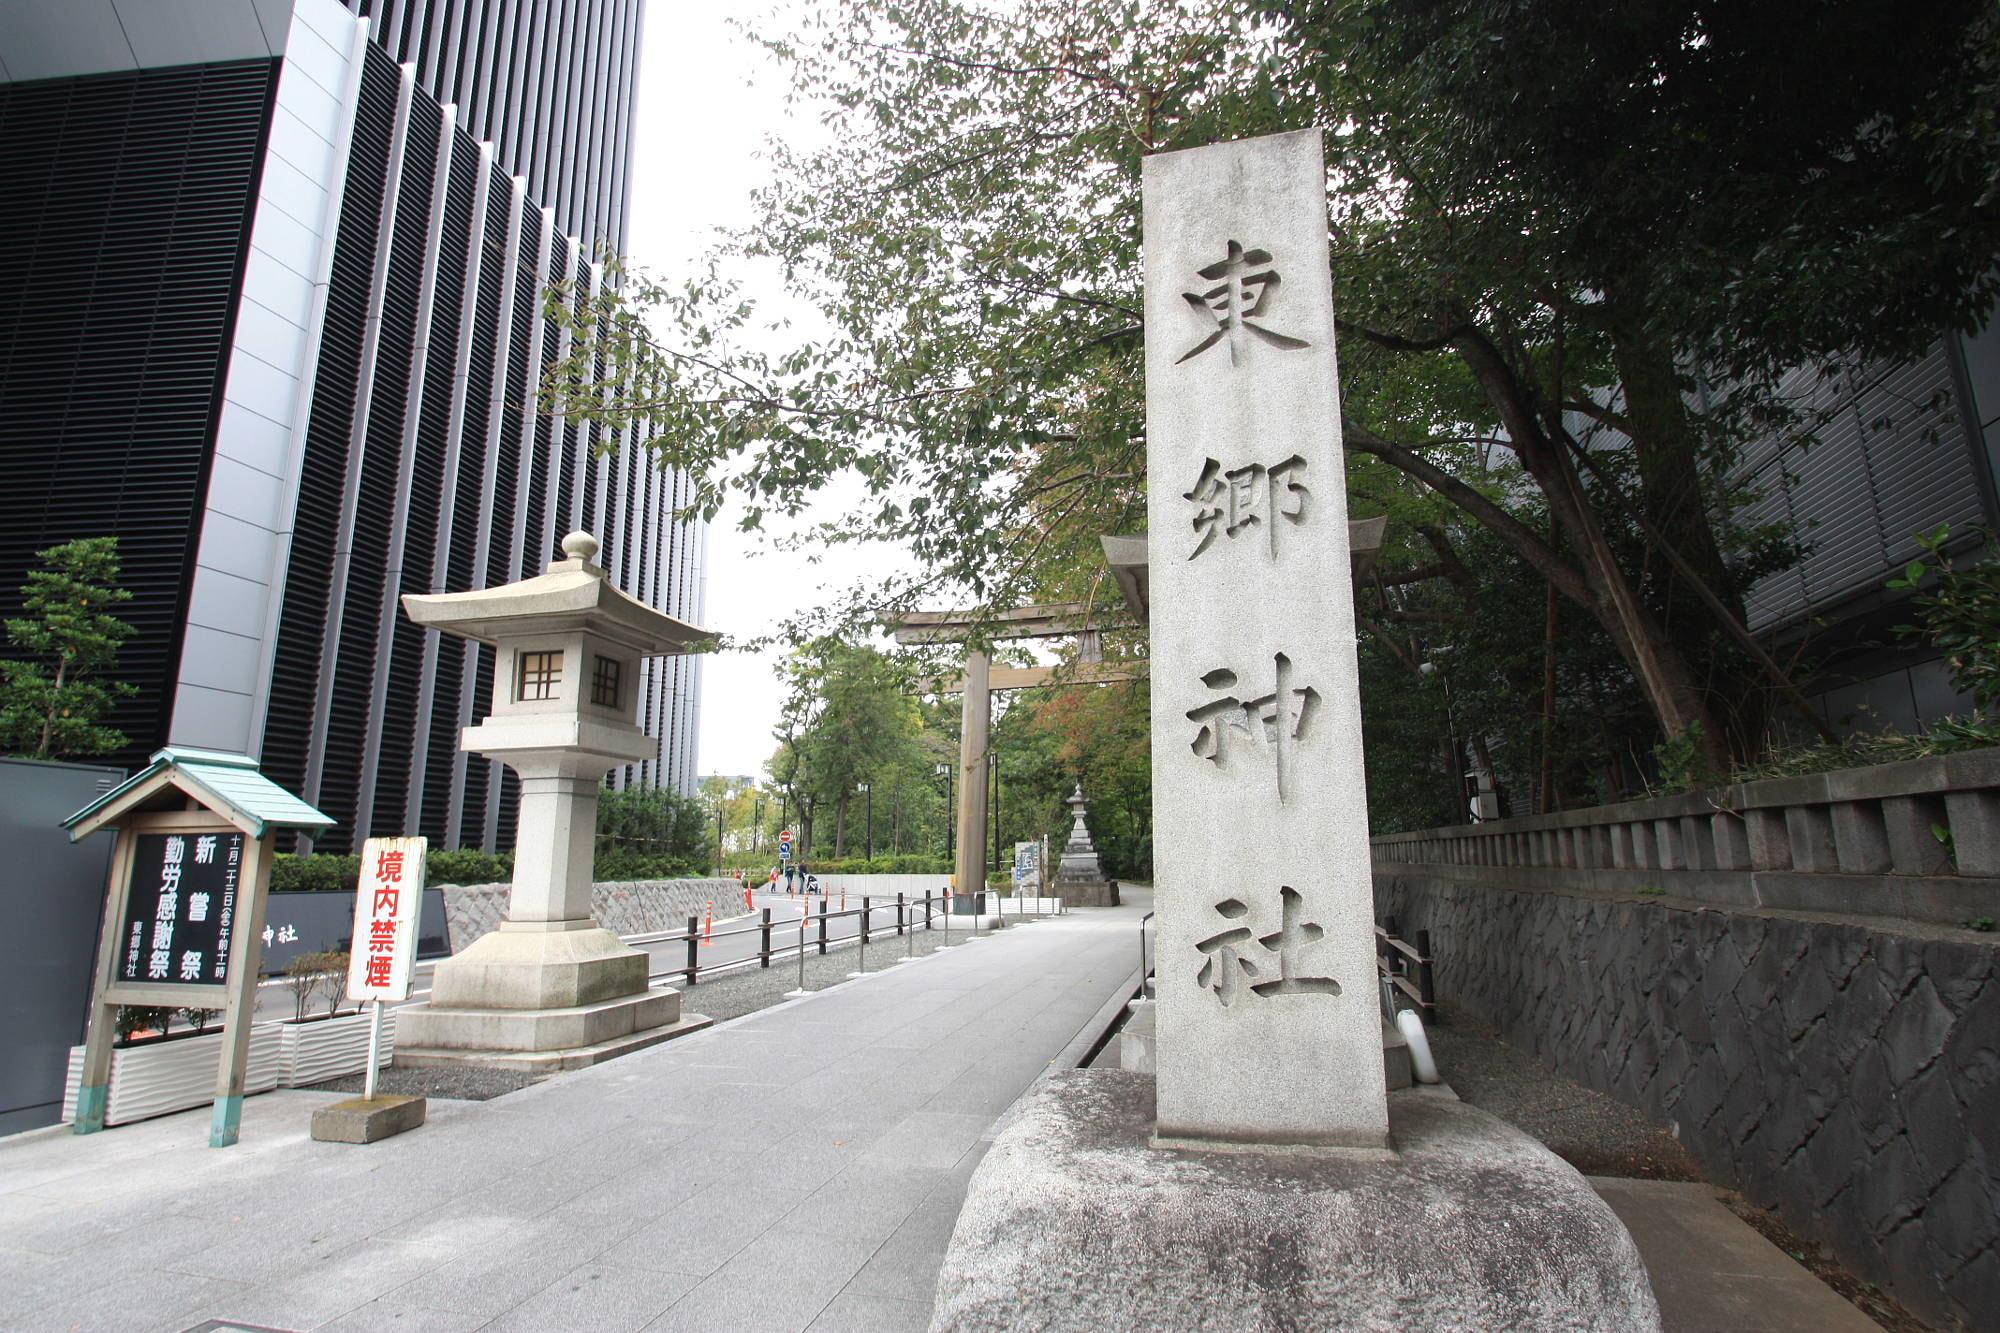 東郷神社の社号標